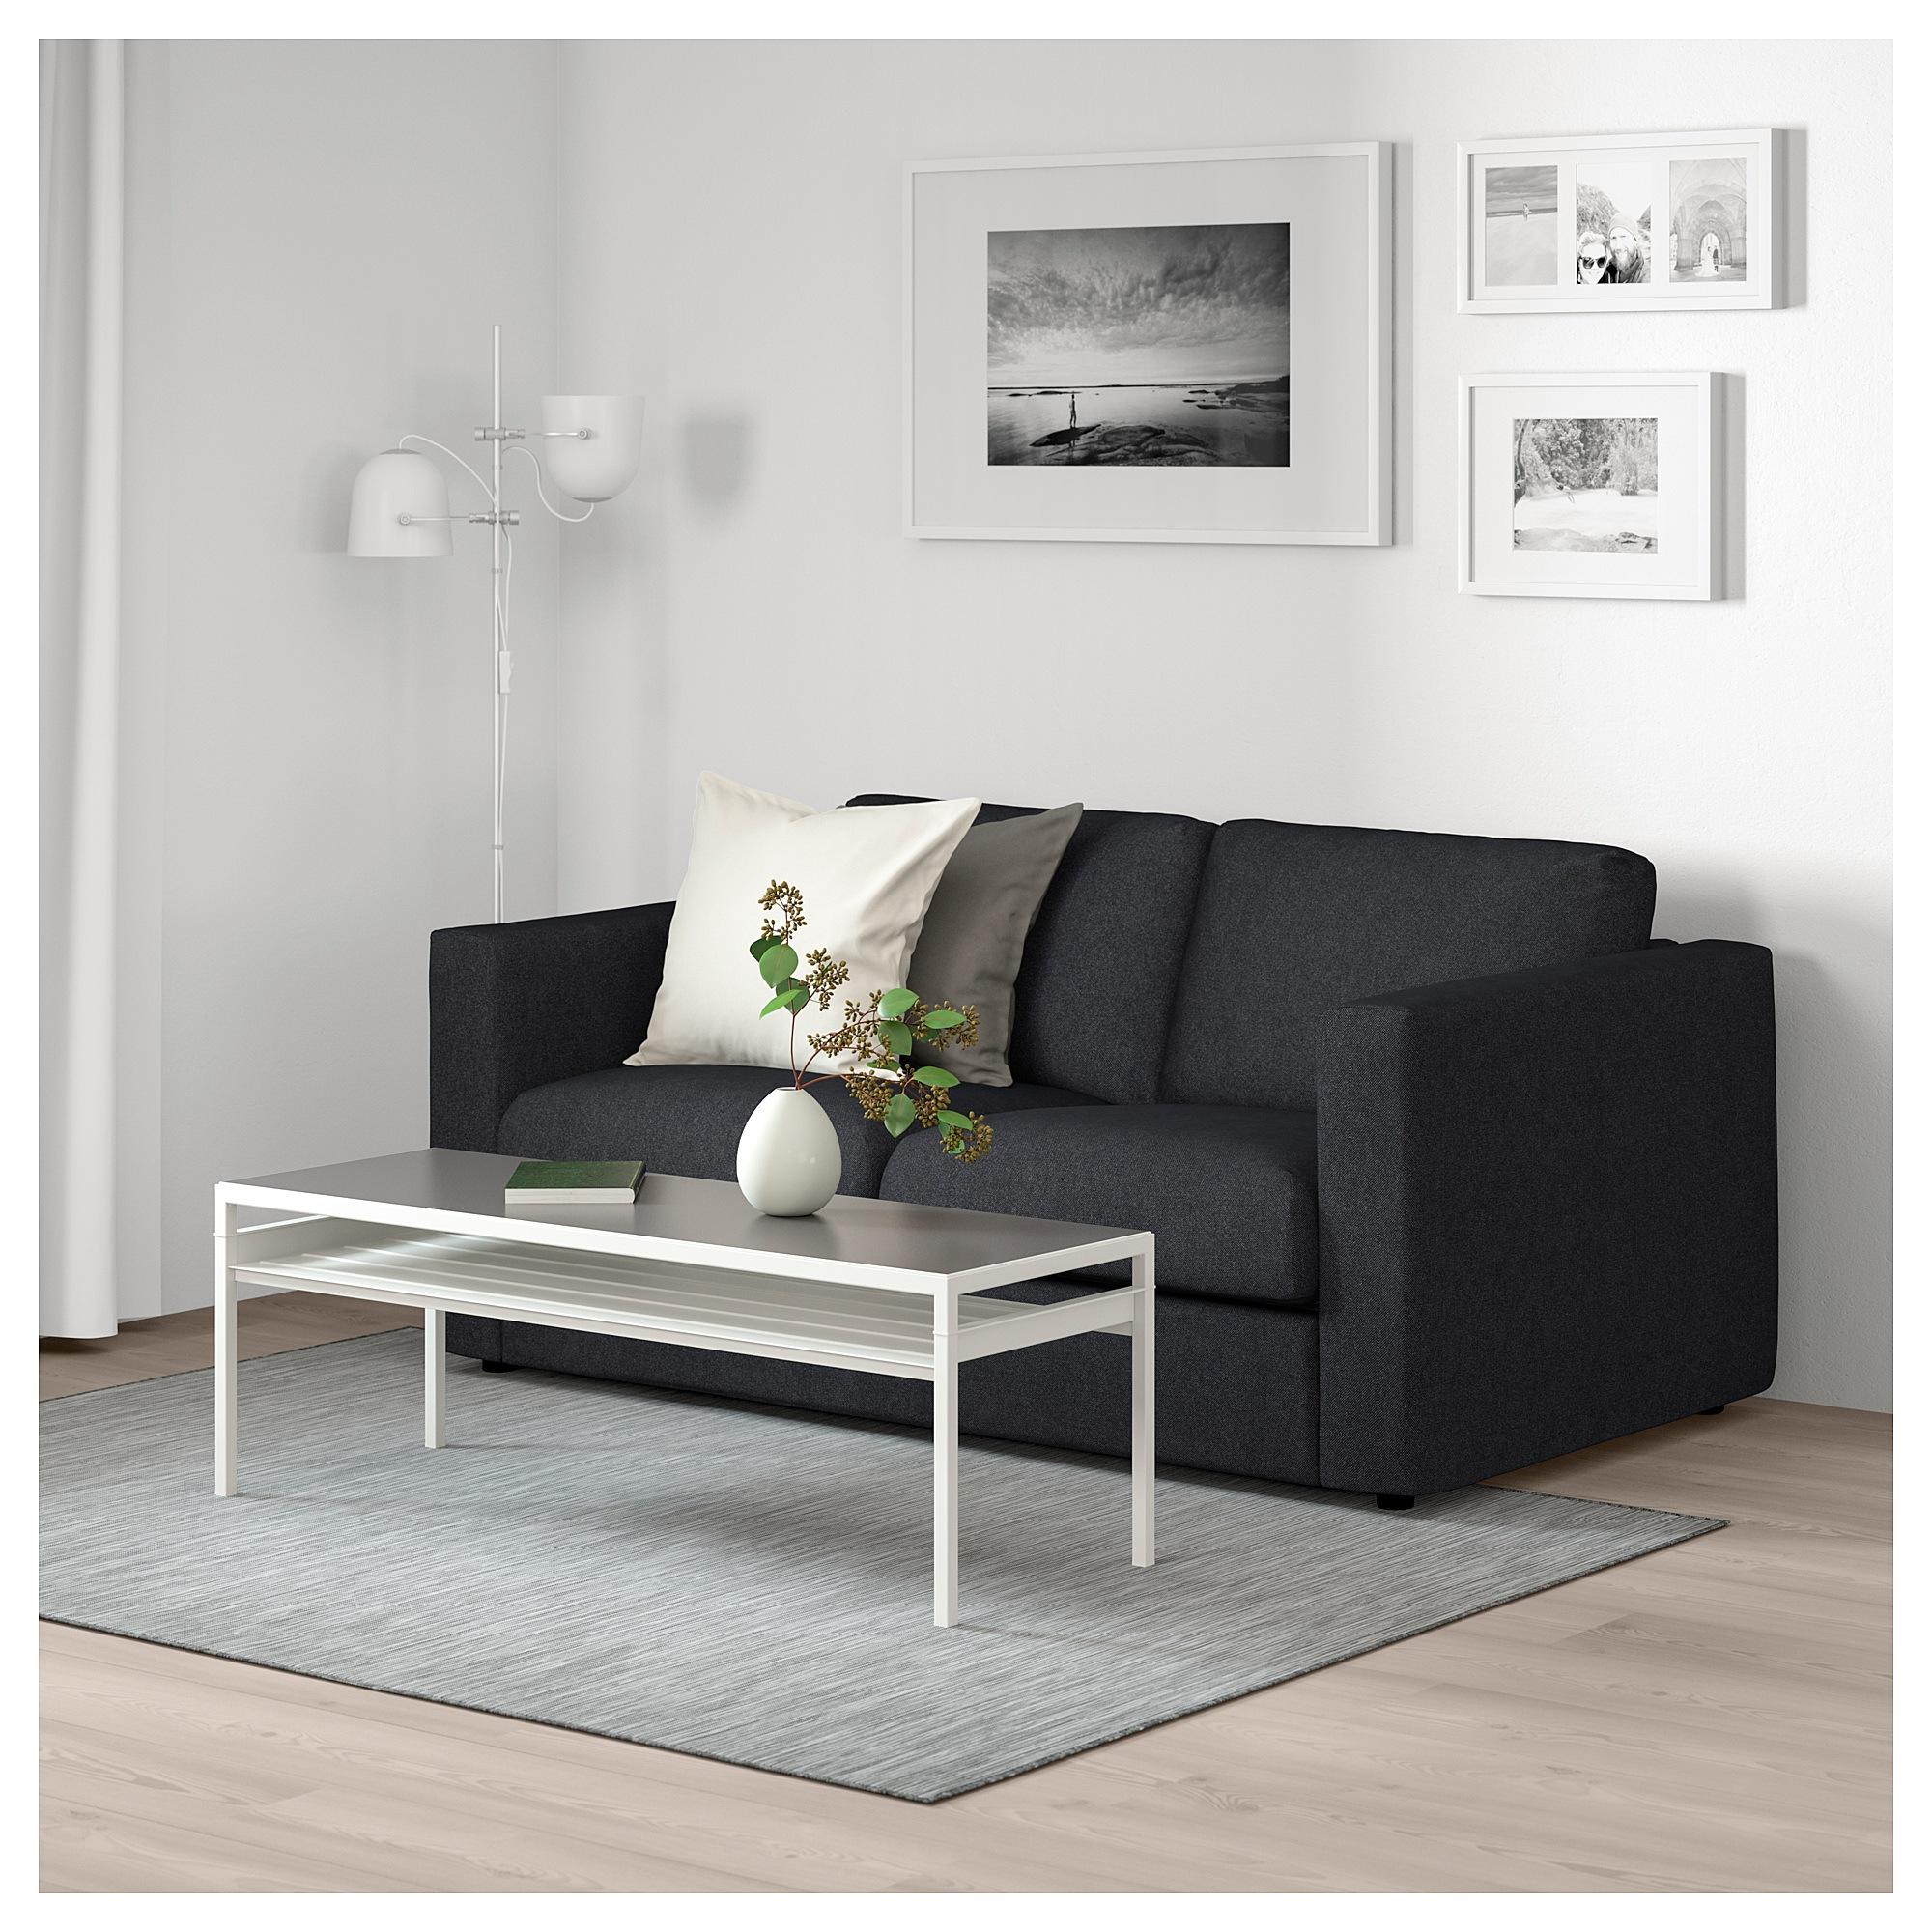 Furniture Home Furnishings Find Your Inspiration Ikea Sofa Sofa Cosy Sofa